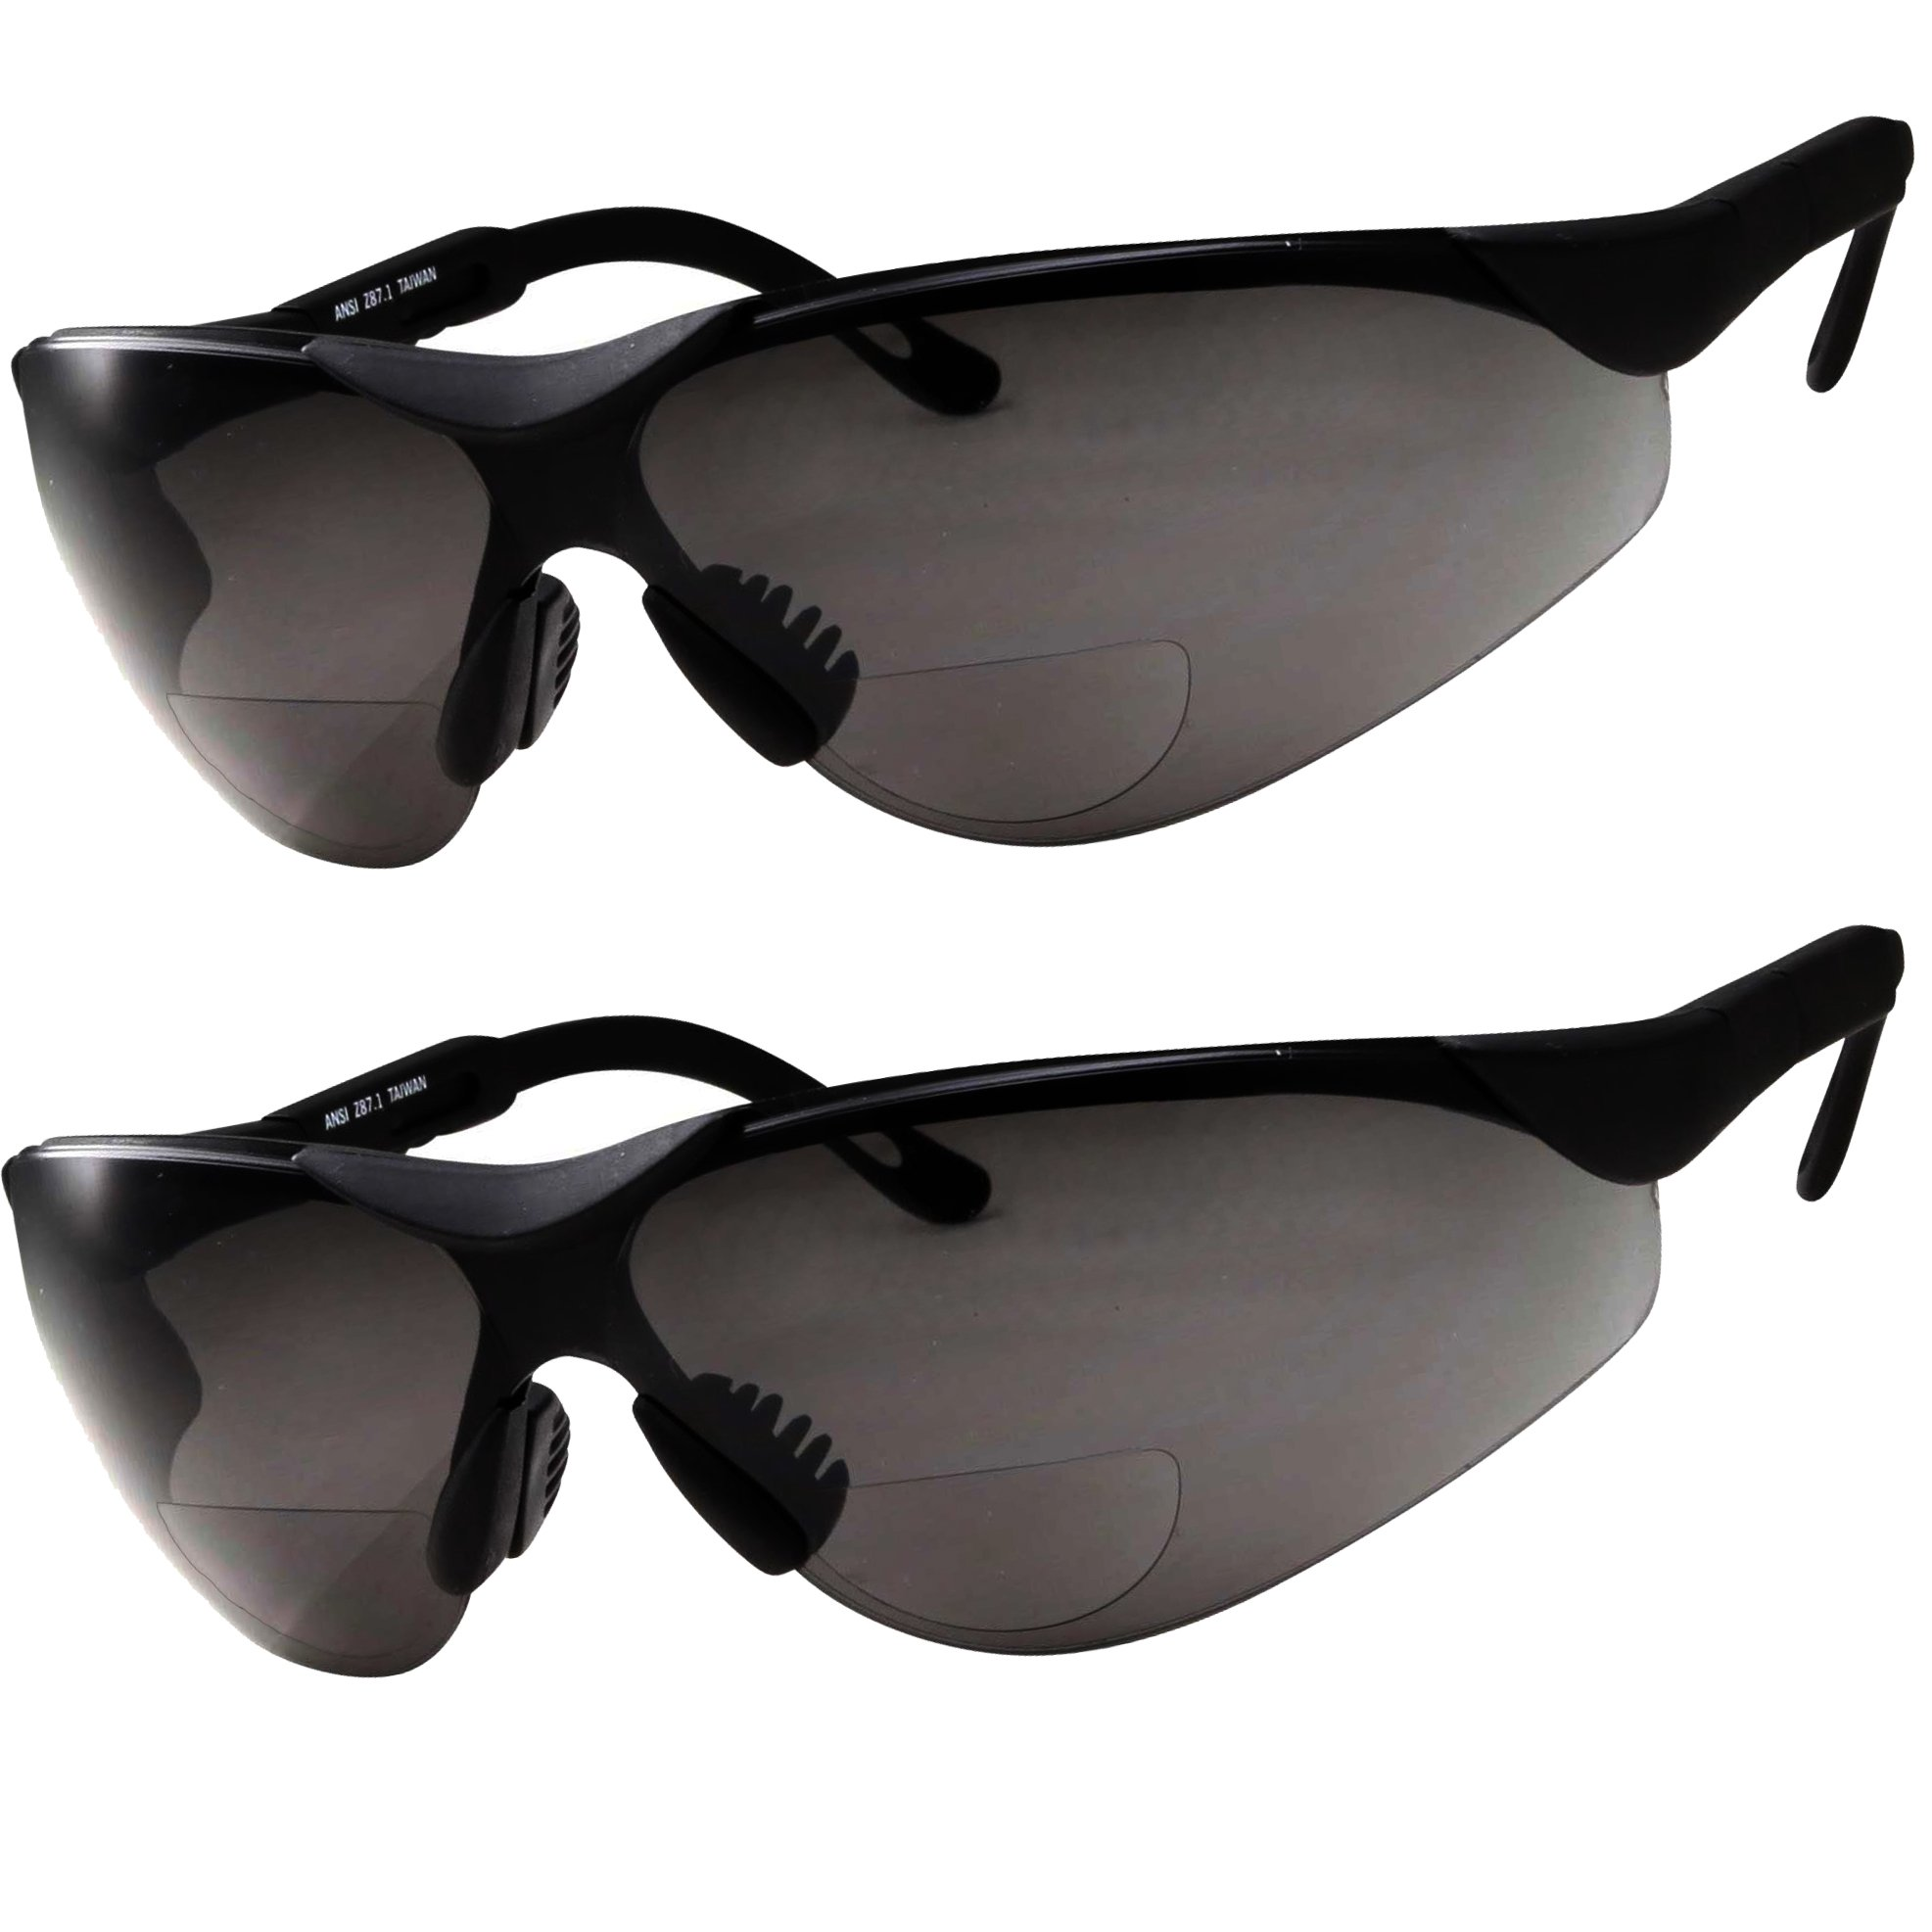 Bifocal Safety Sunglasses Reading Corner